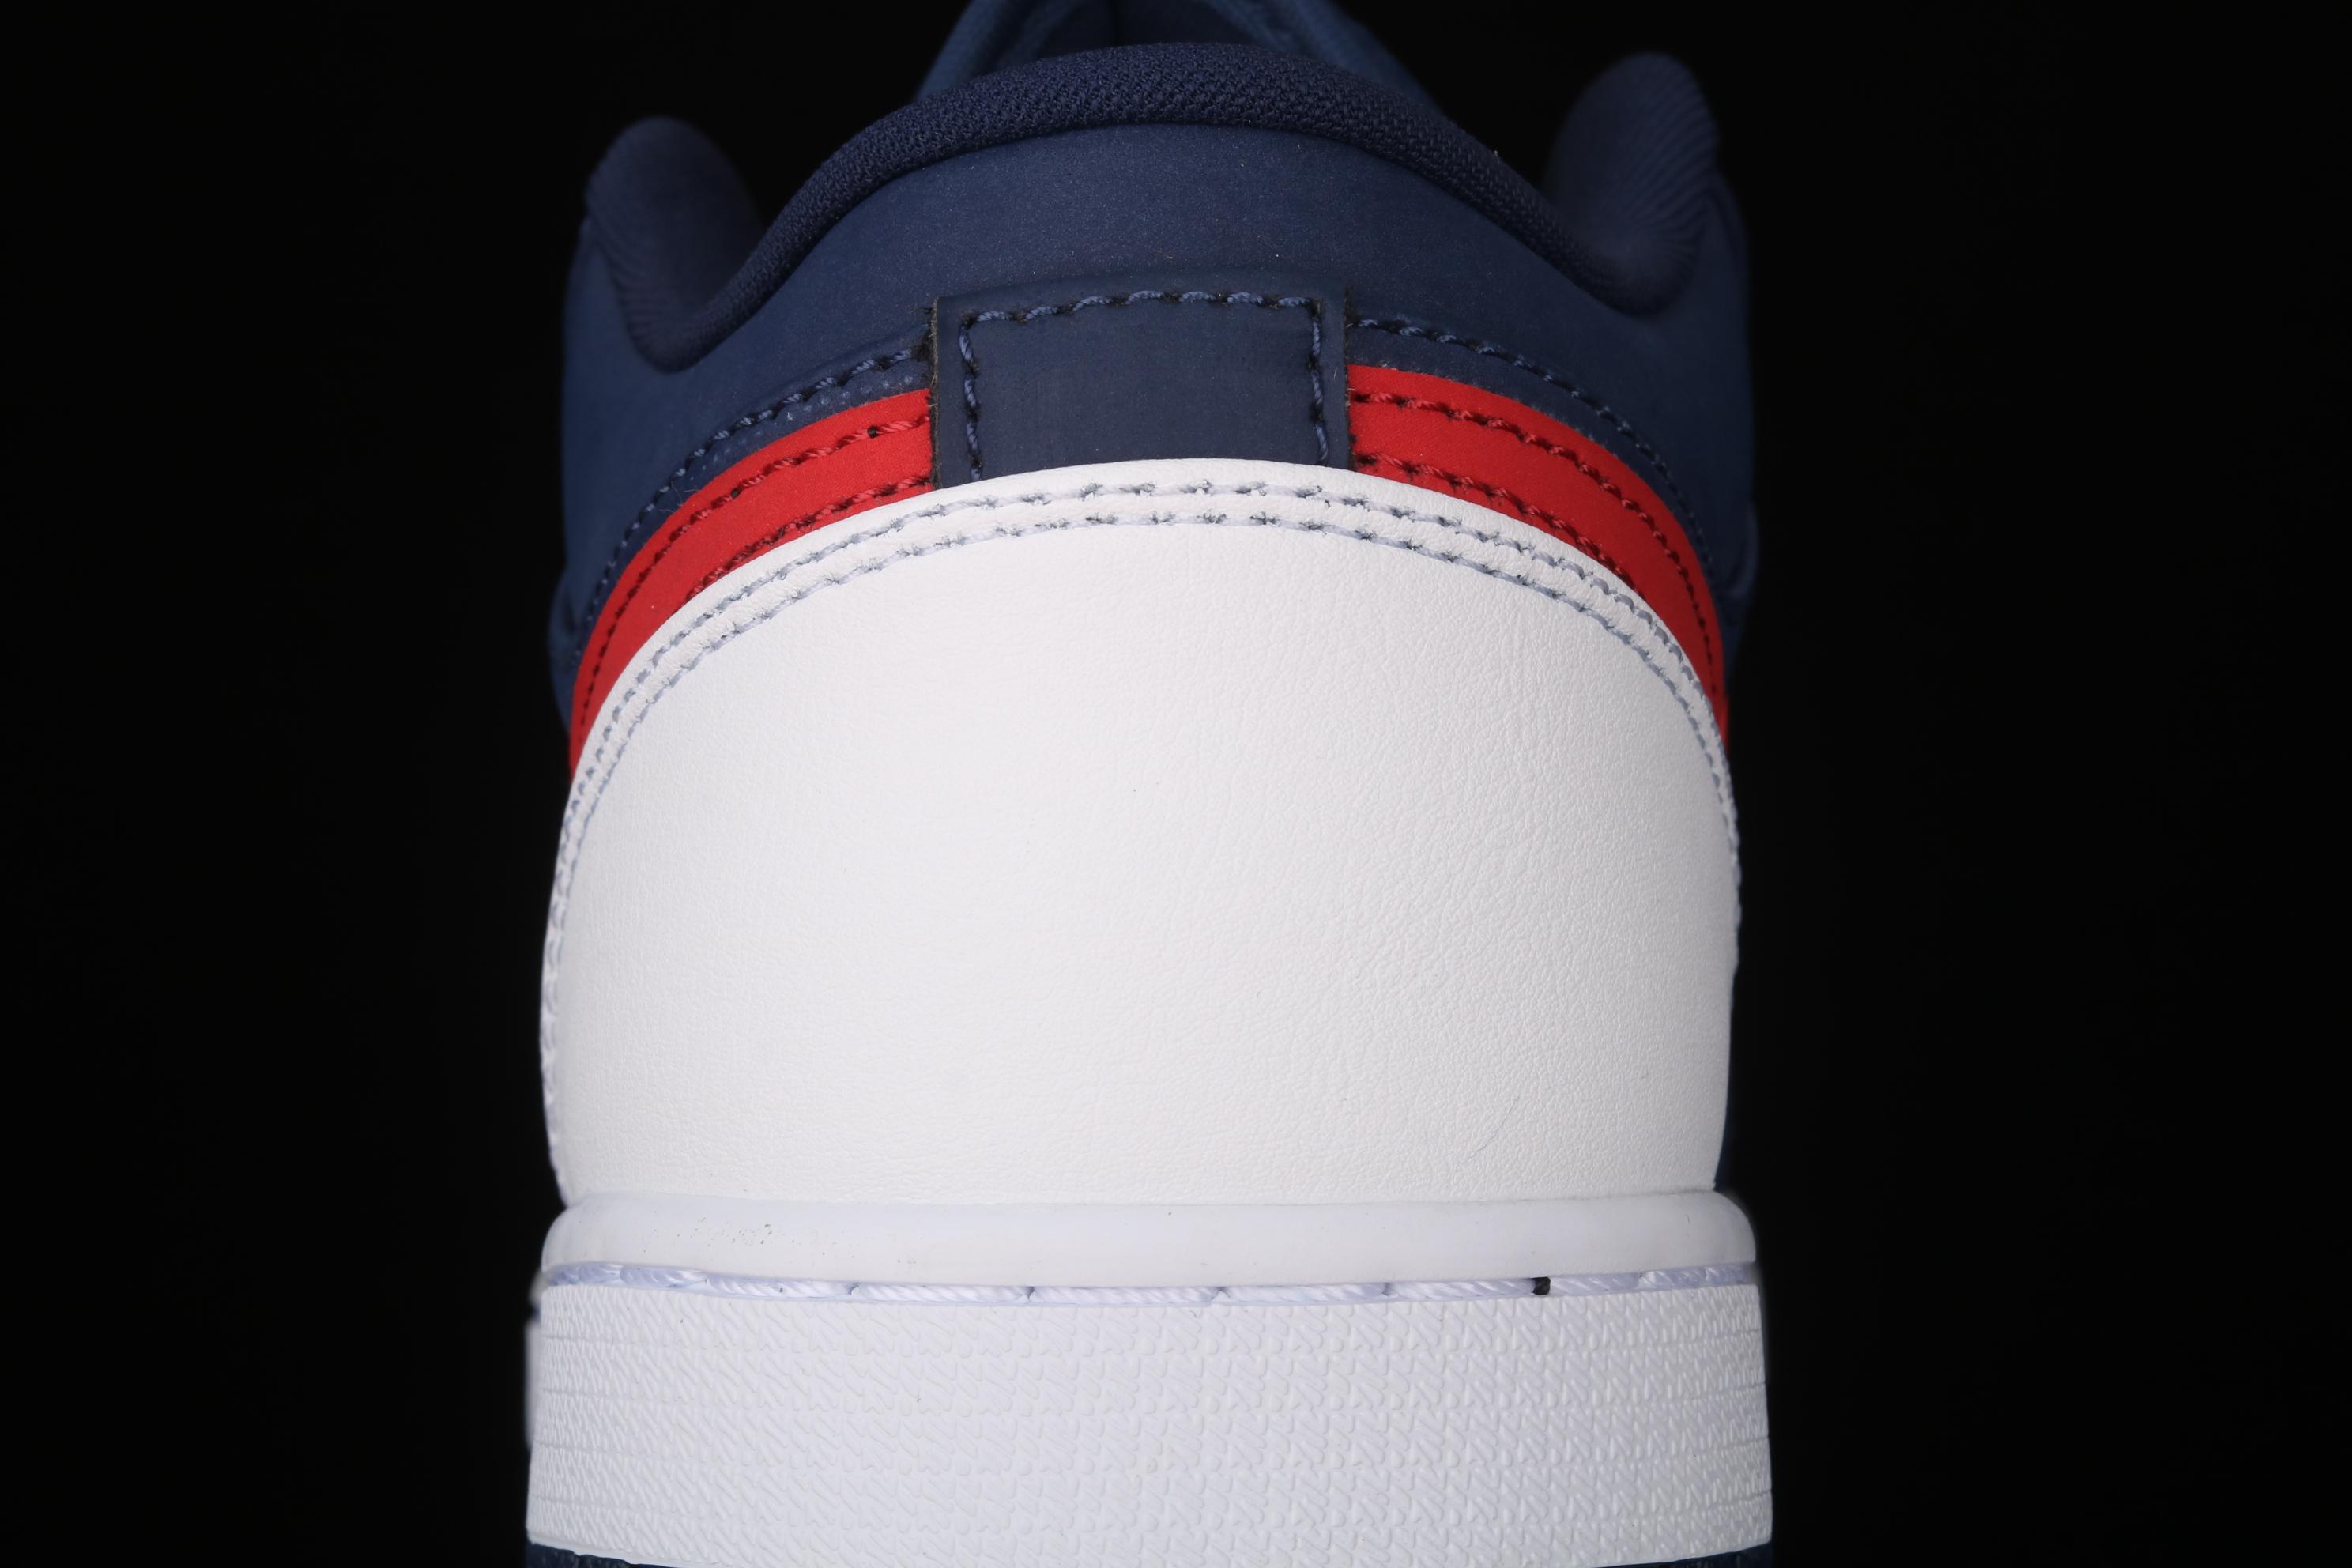 G版纯原 Air Jordan 1 Low AJ1 乔1爱国者蓝红 低帮文化休闲运动板鞋 CZ8454-400